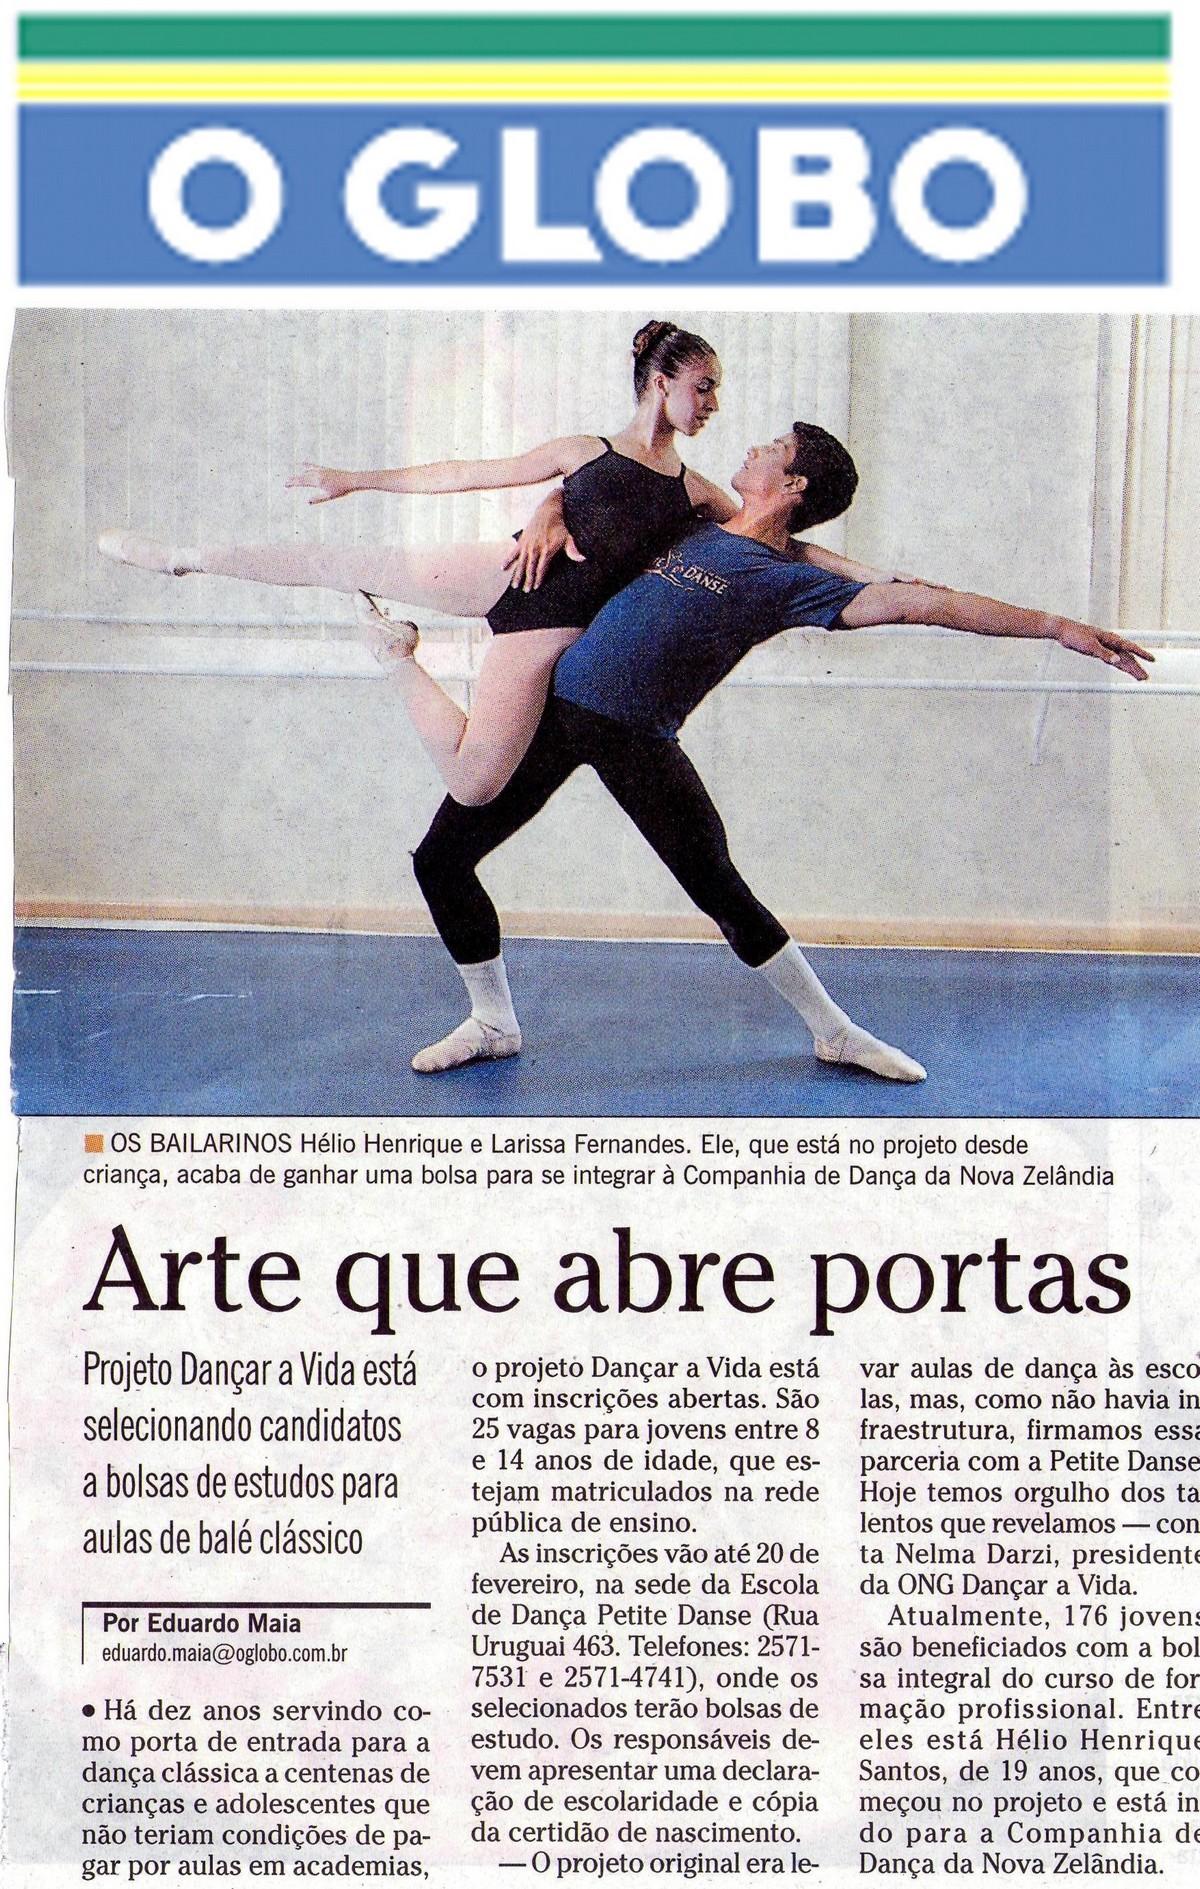 Escola de Dança Petite Danse na Mídia